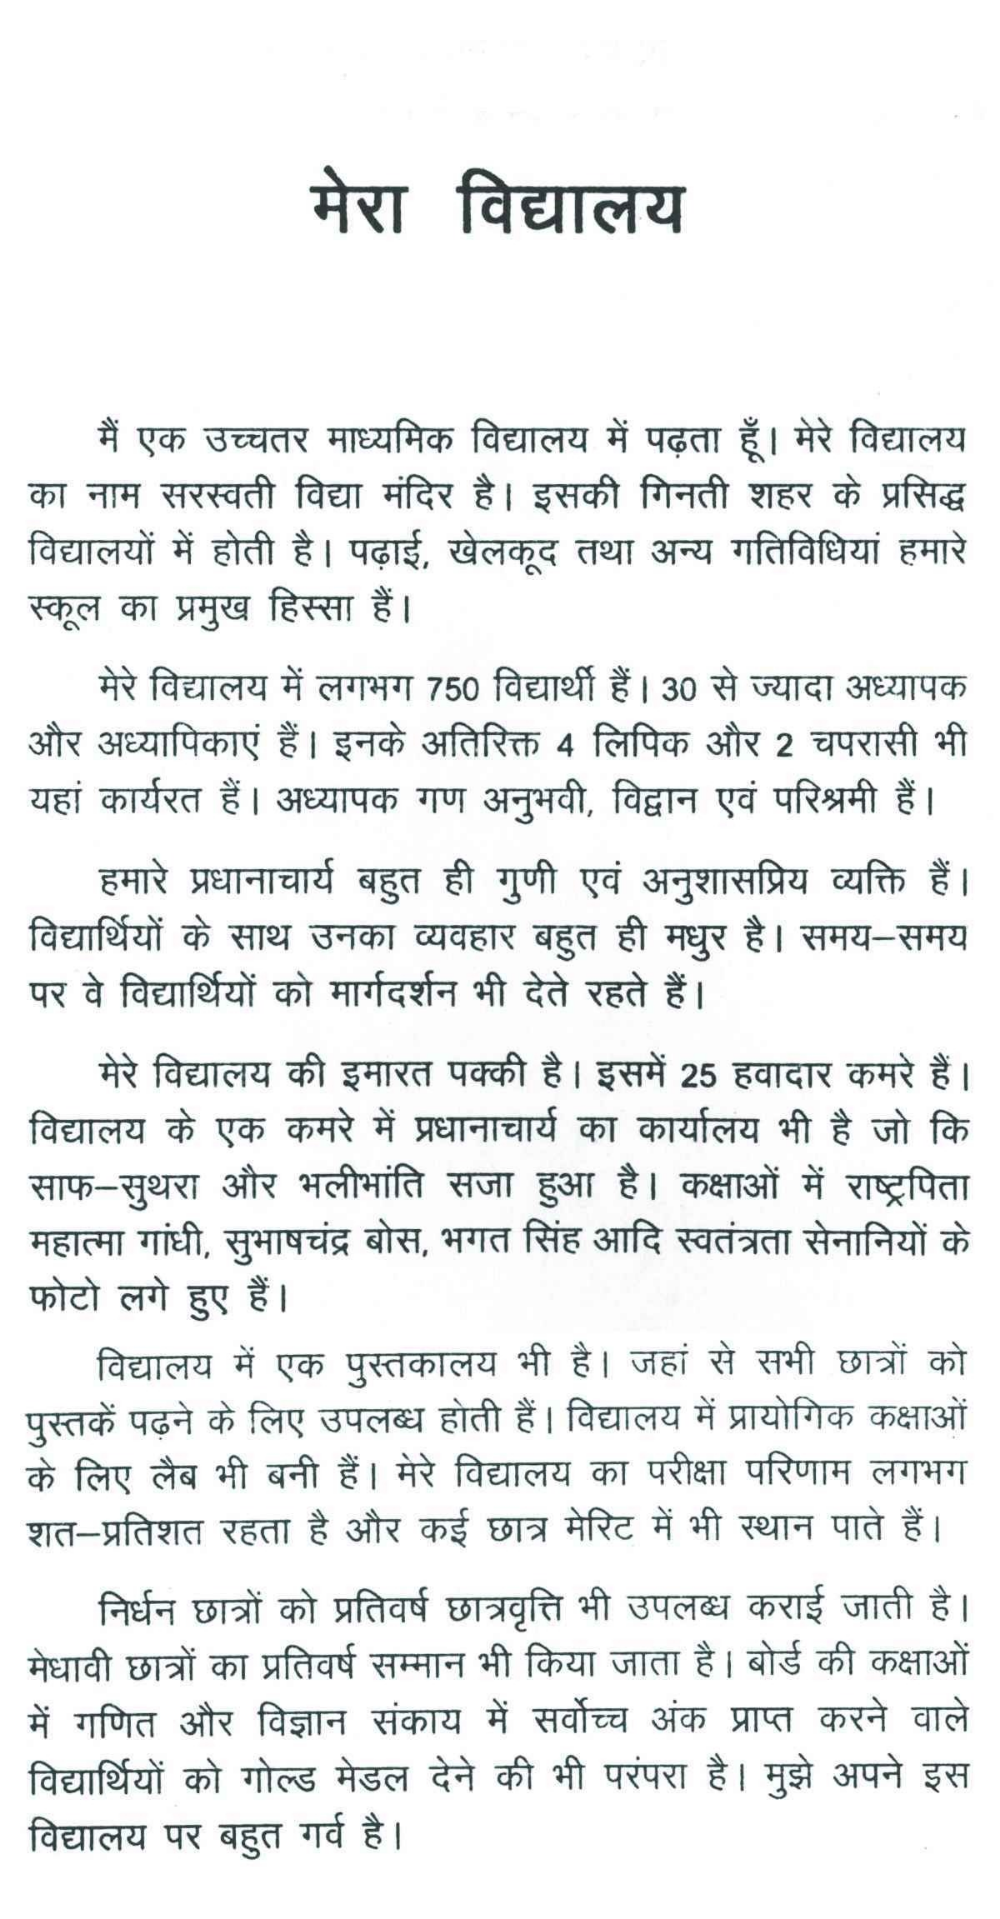 About School In Hindi Google Search Expository Essay Argumentative Essay Math Homework Help